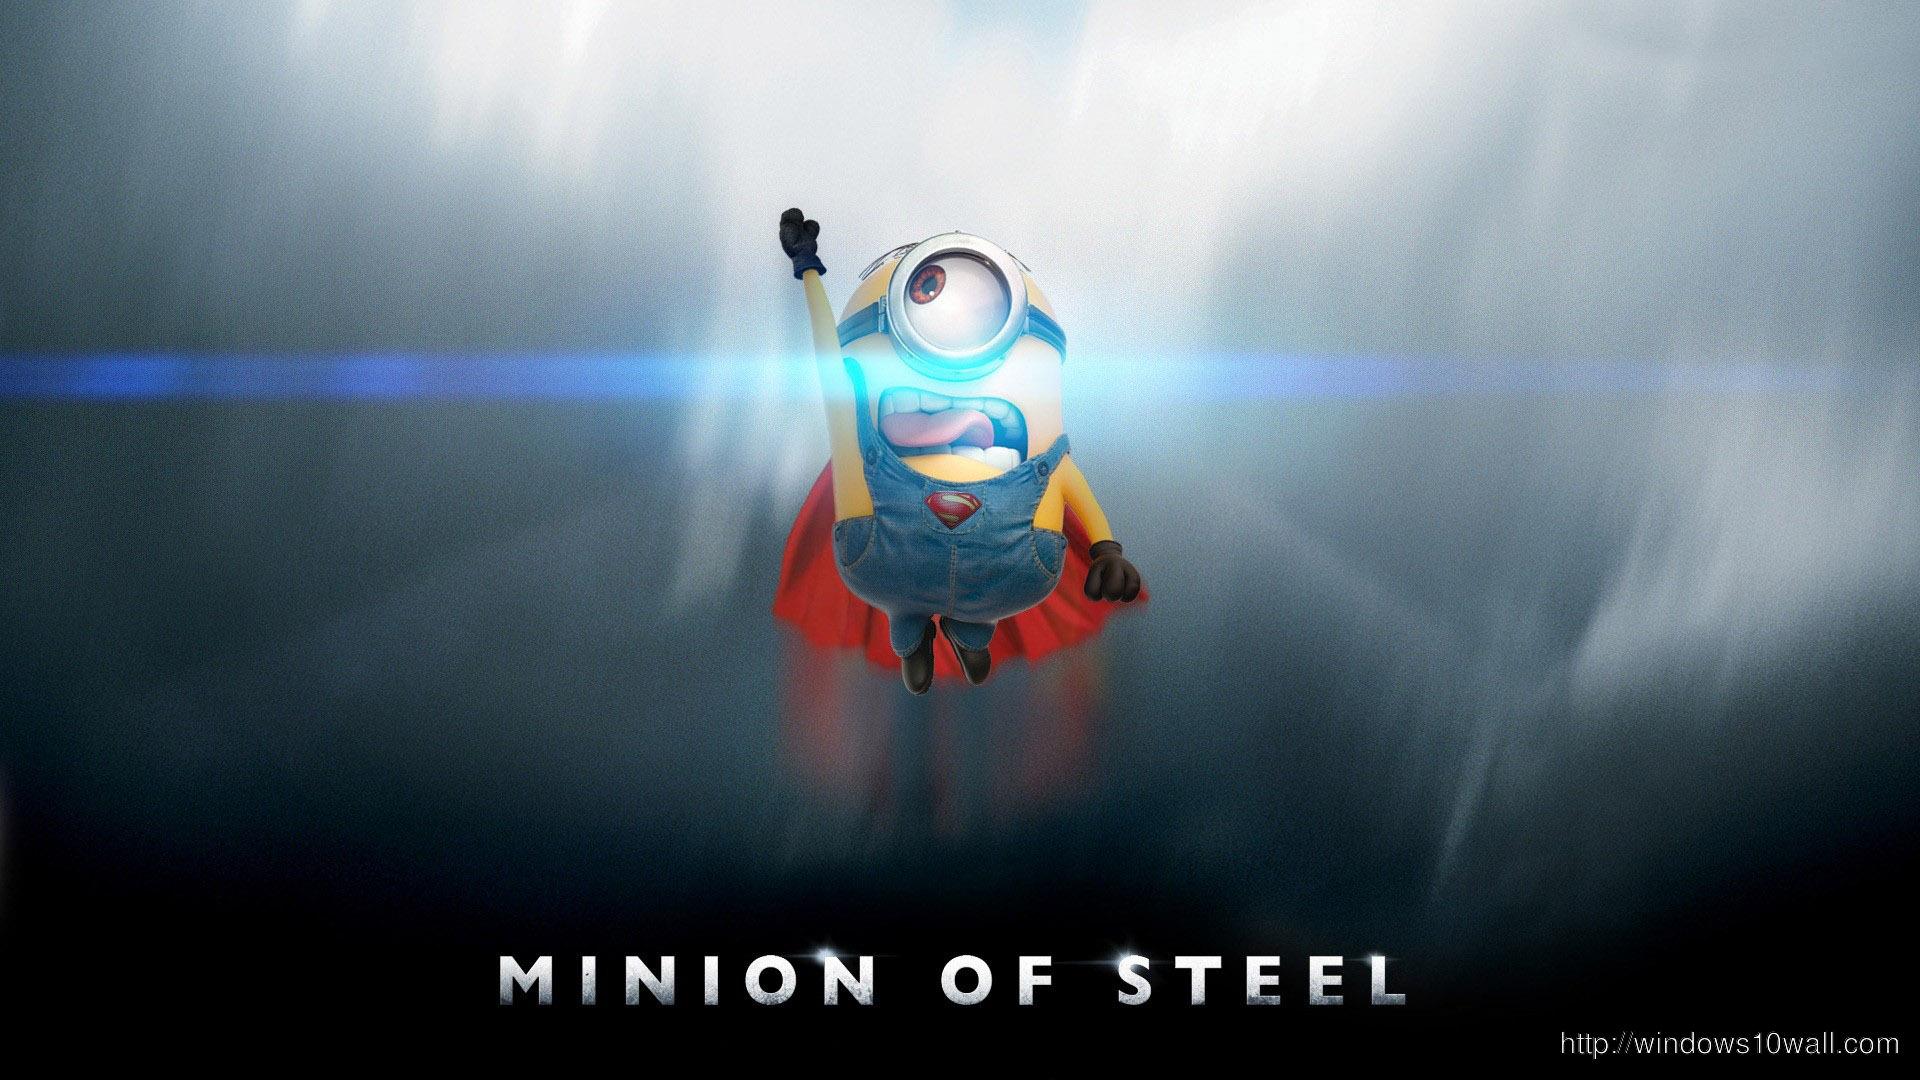 Minion On Steel Background Wallpaper